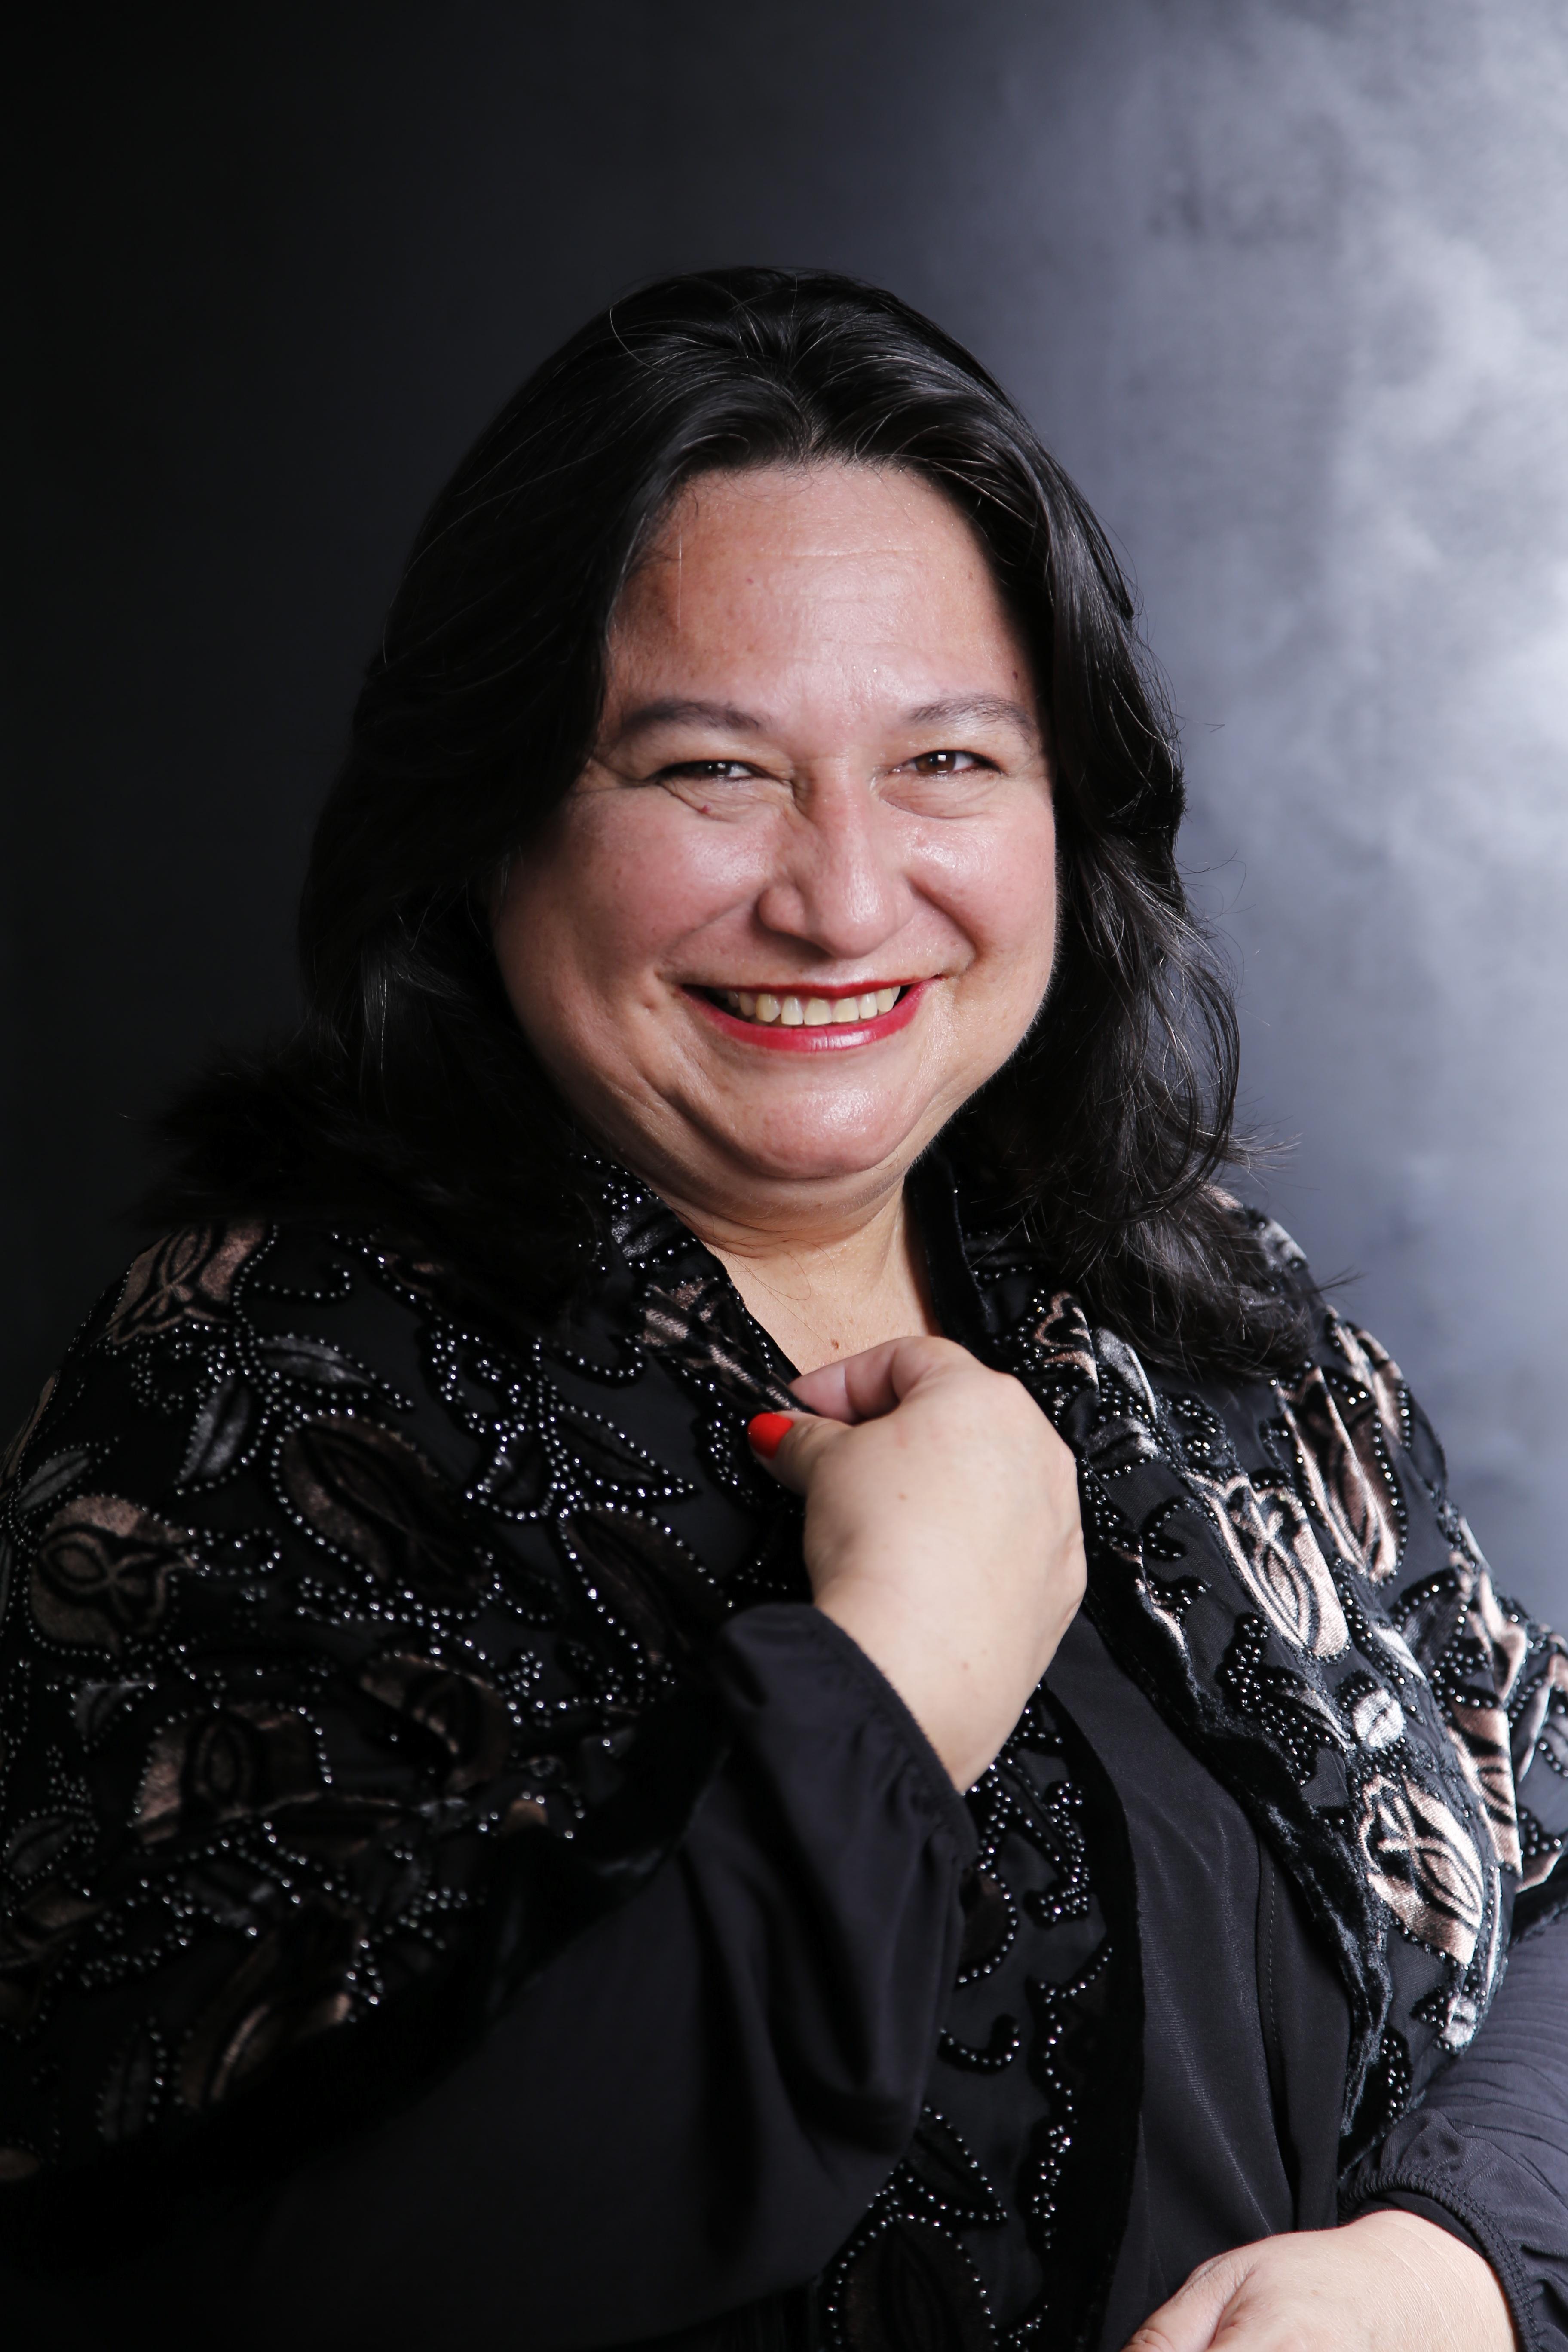 Pepita Soler